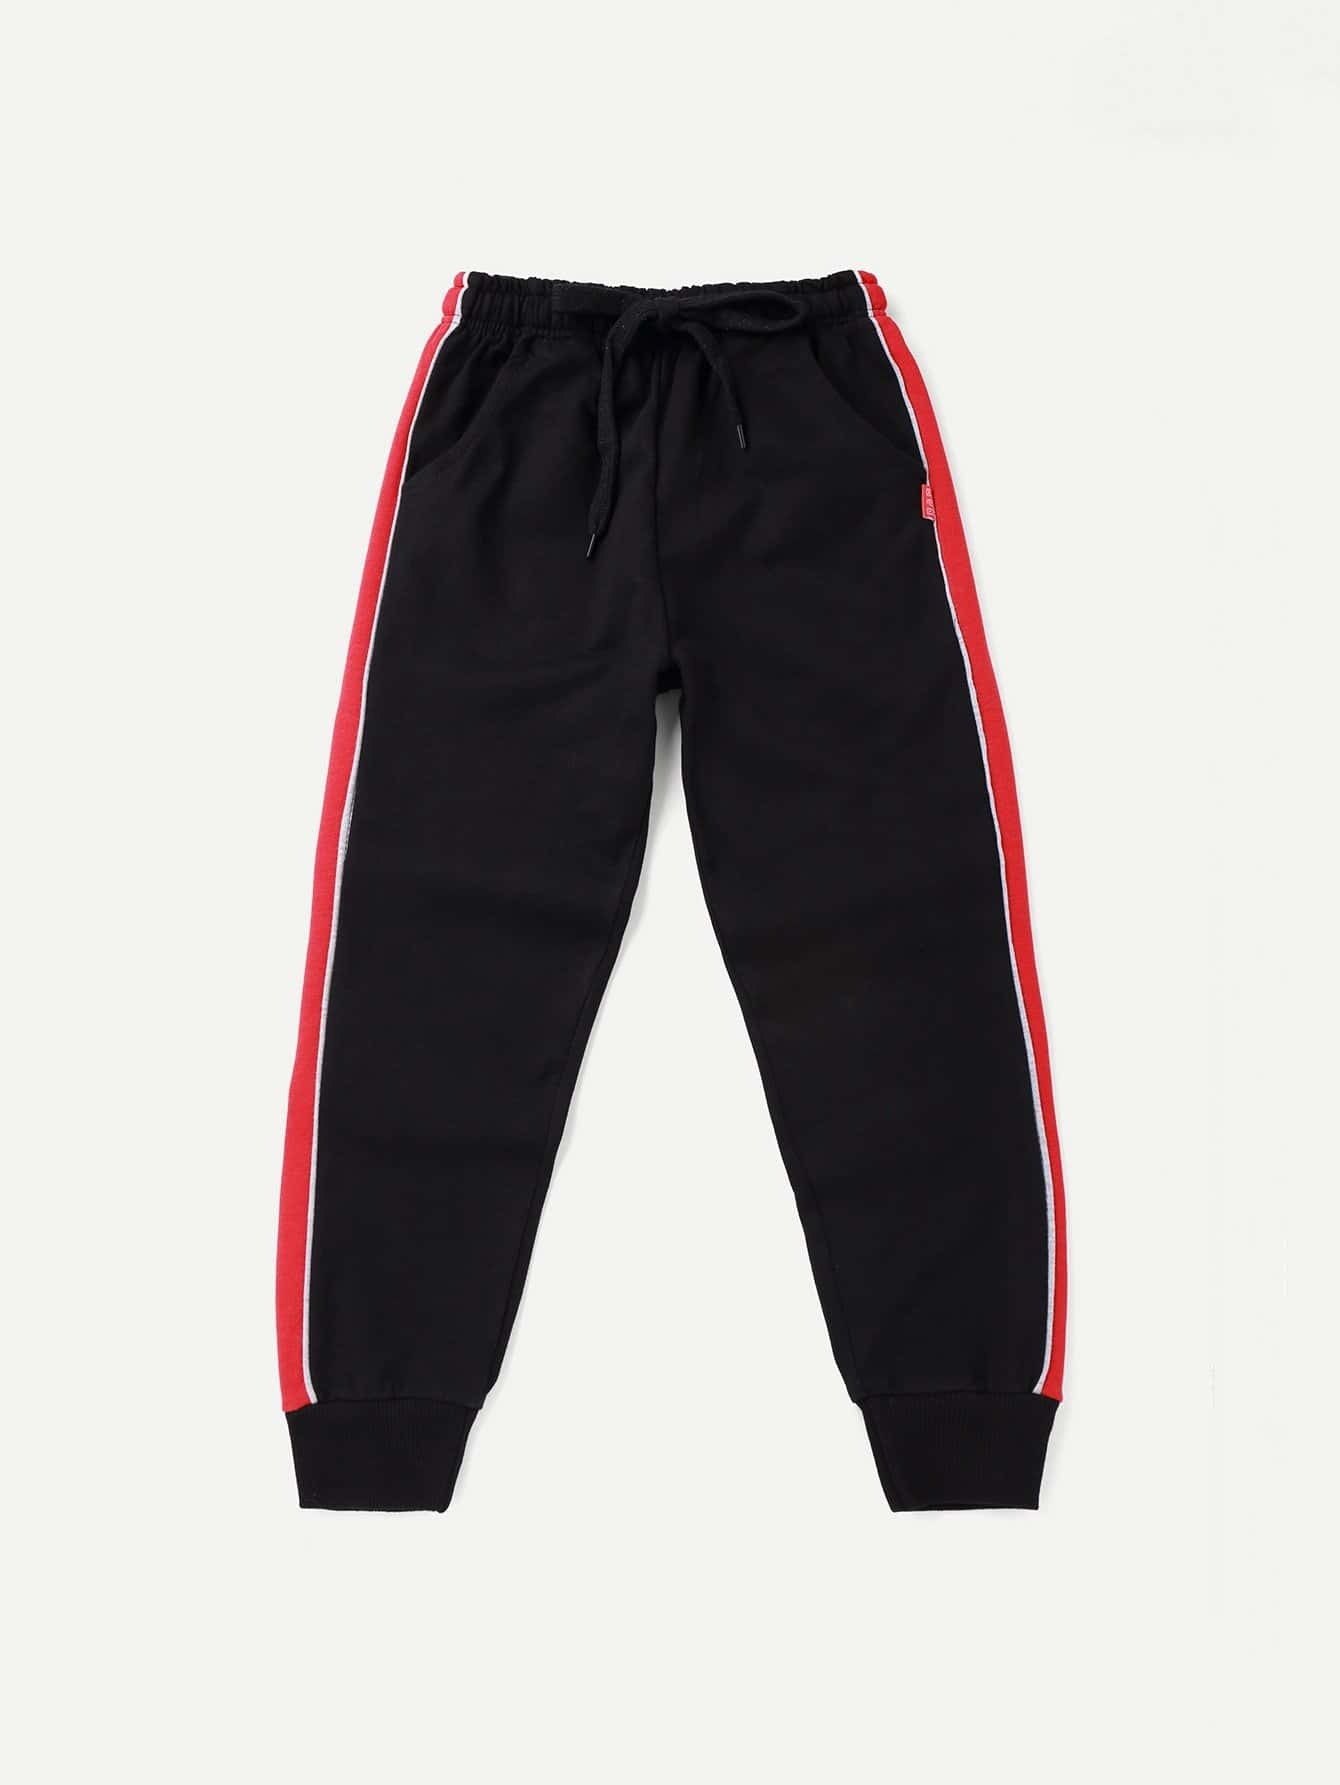 Boys Contrast Tape Side Pants